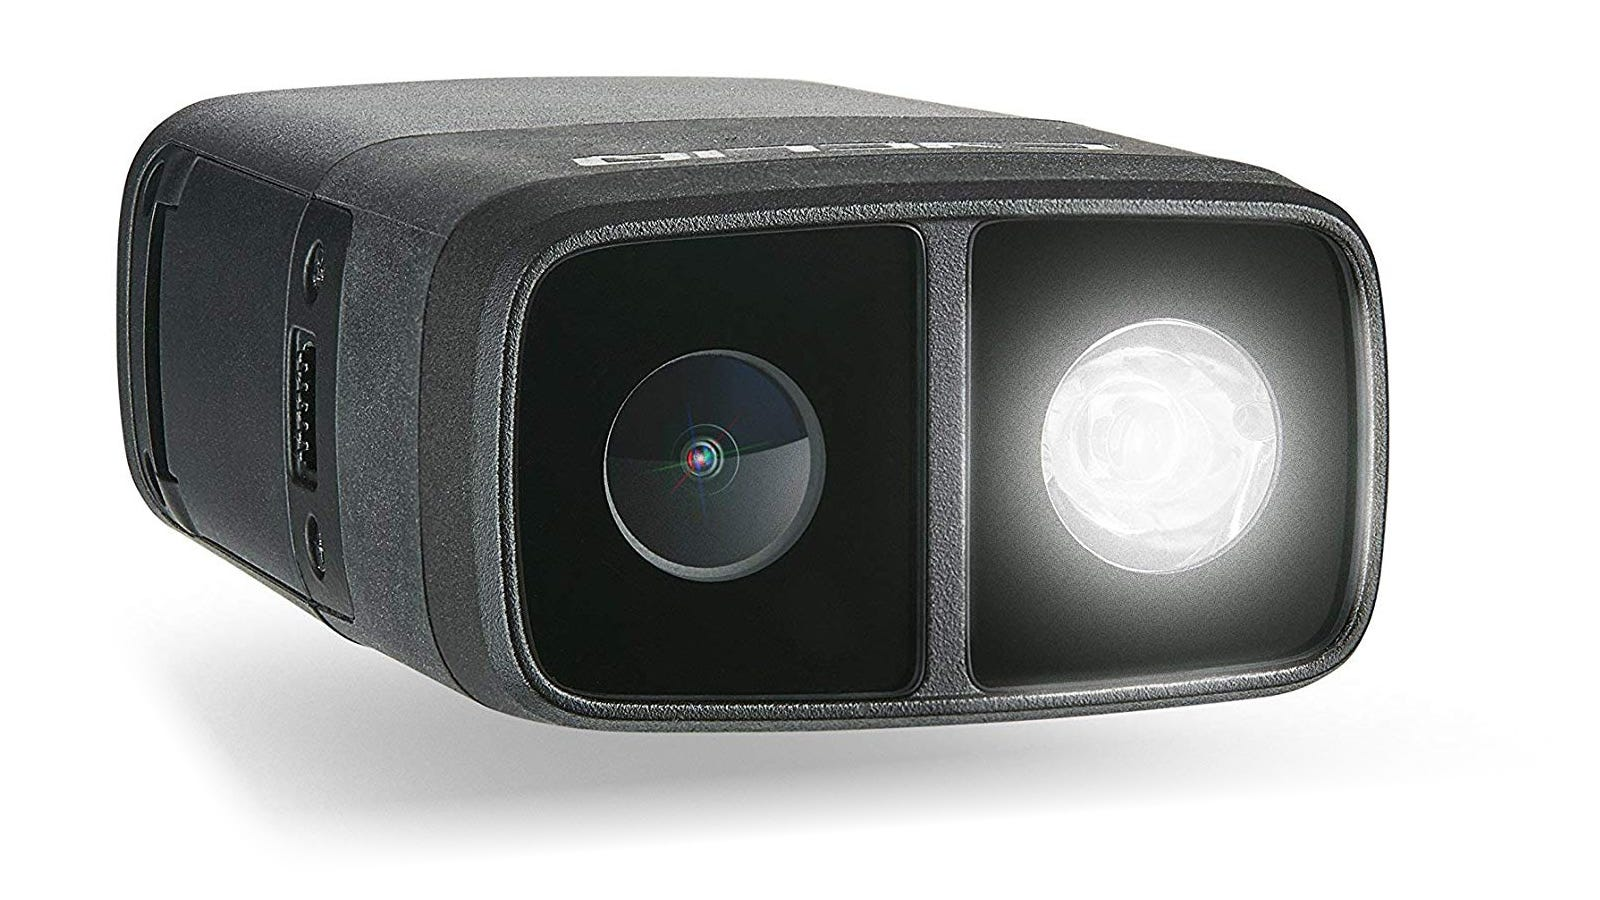 The Cycliq Fly12 CE camera and bike light.